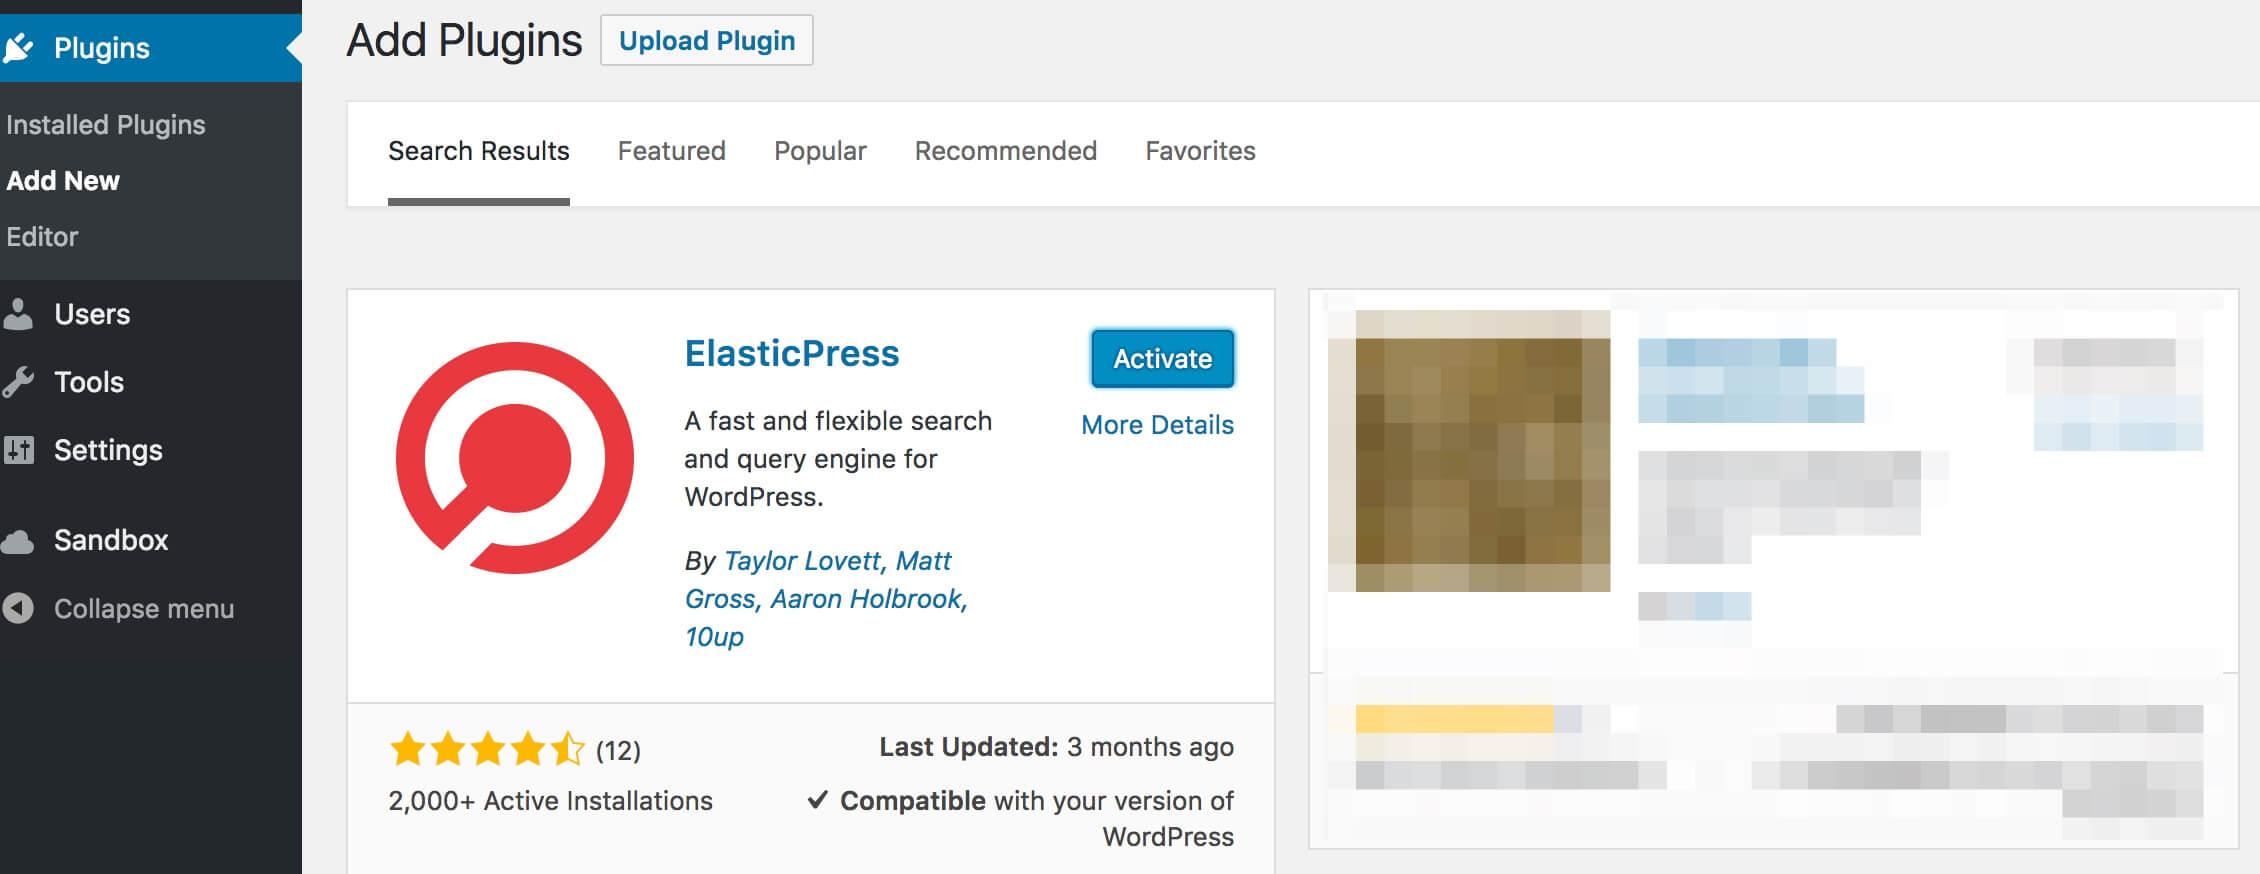 Add ElasticPress WordPress Search Plugin